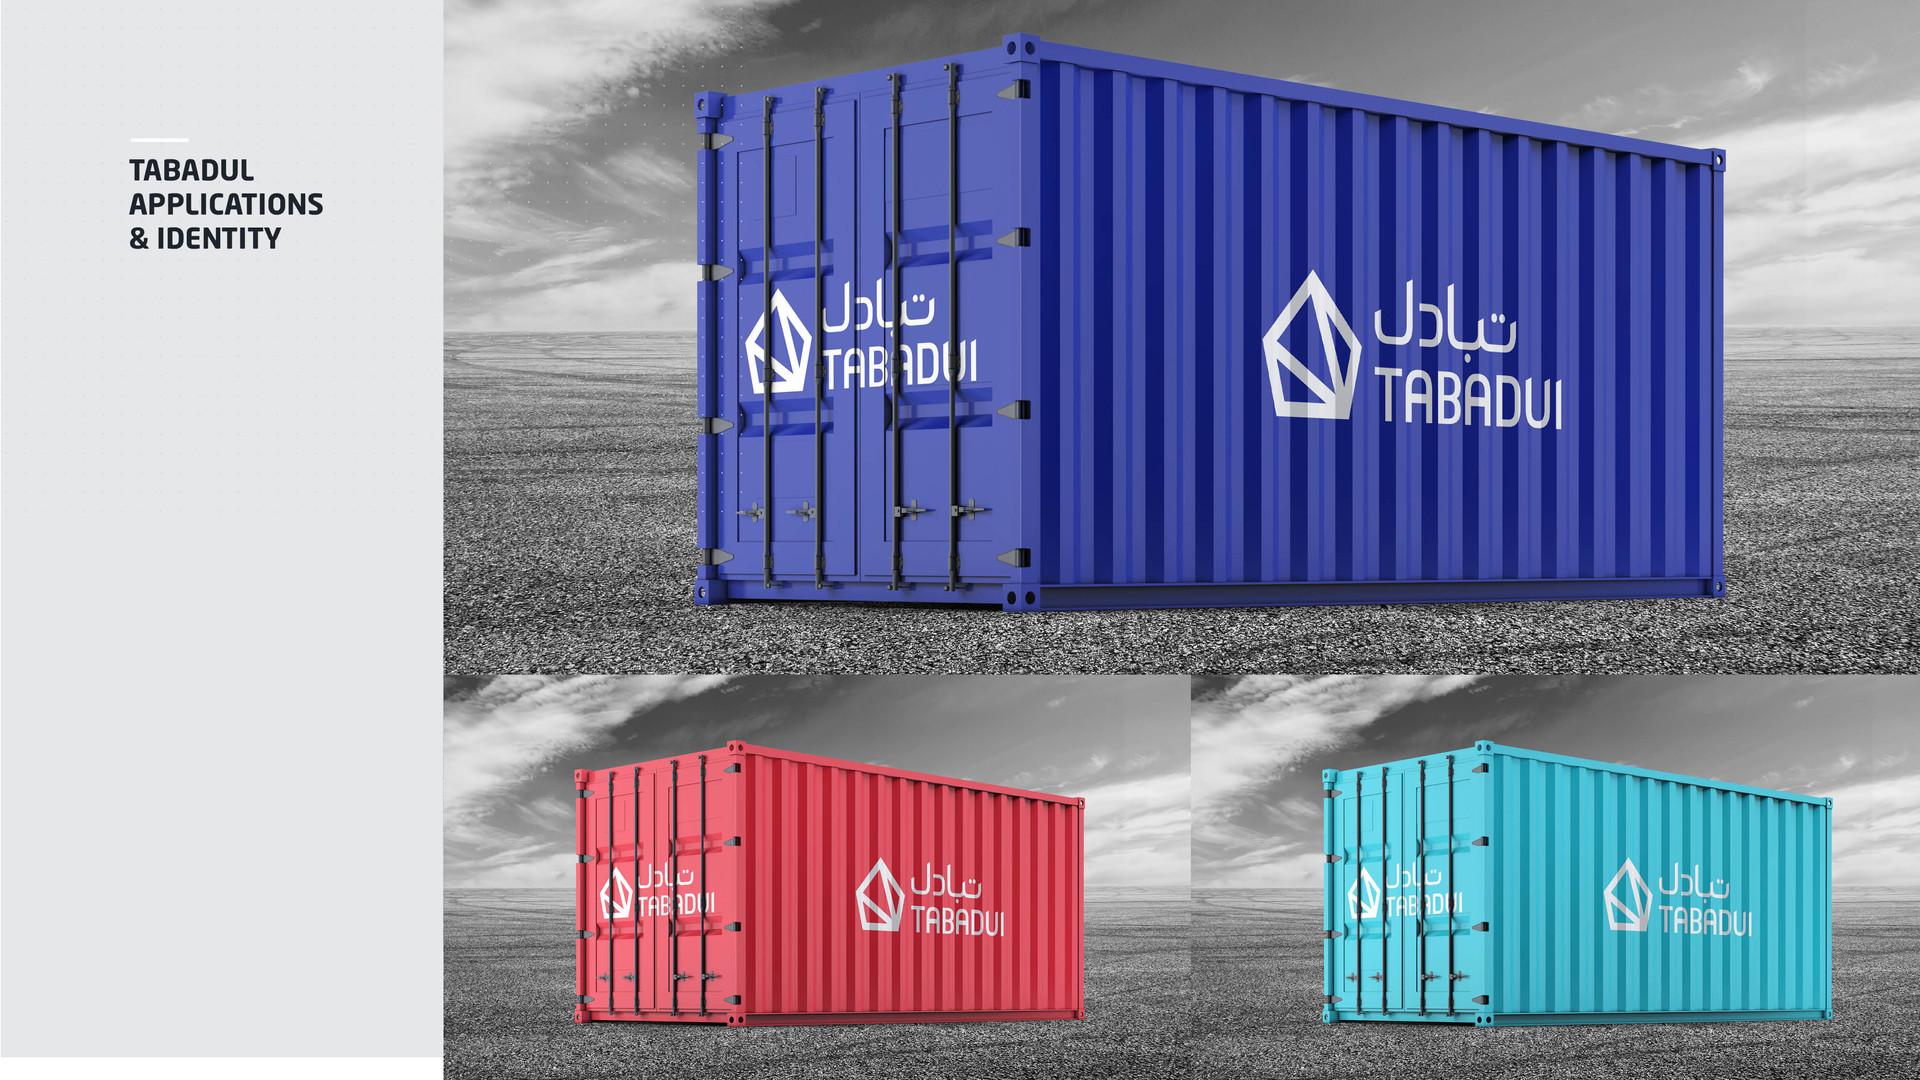 Tabadul Brand and Identity